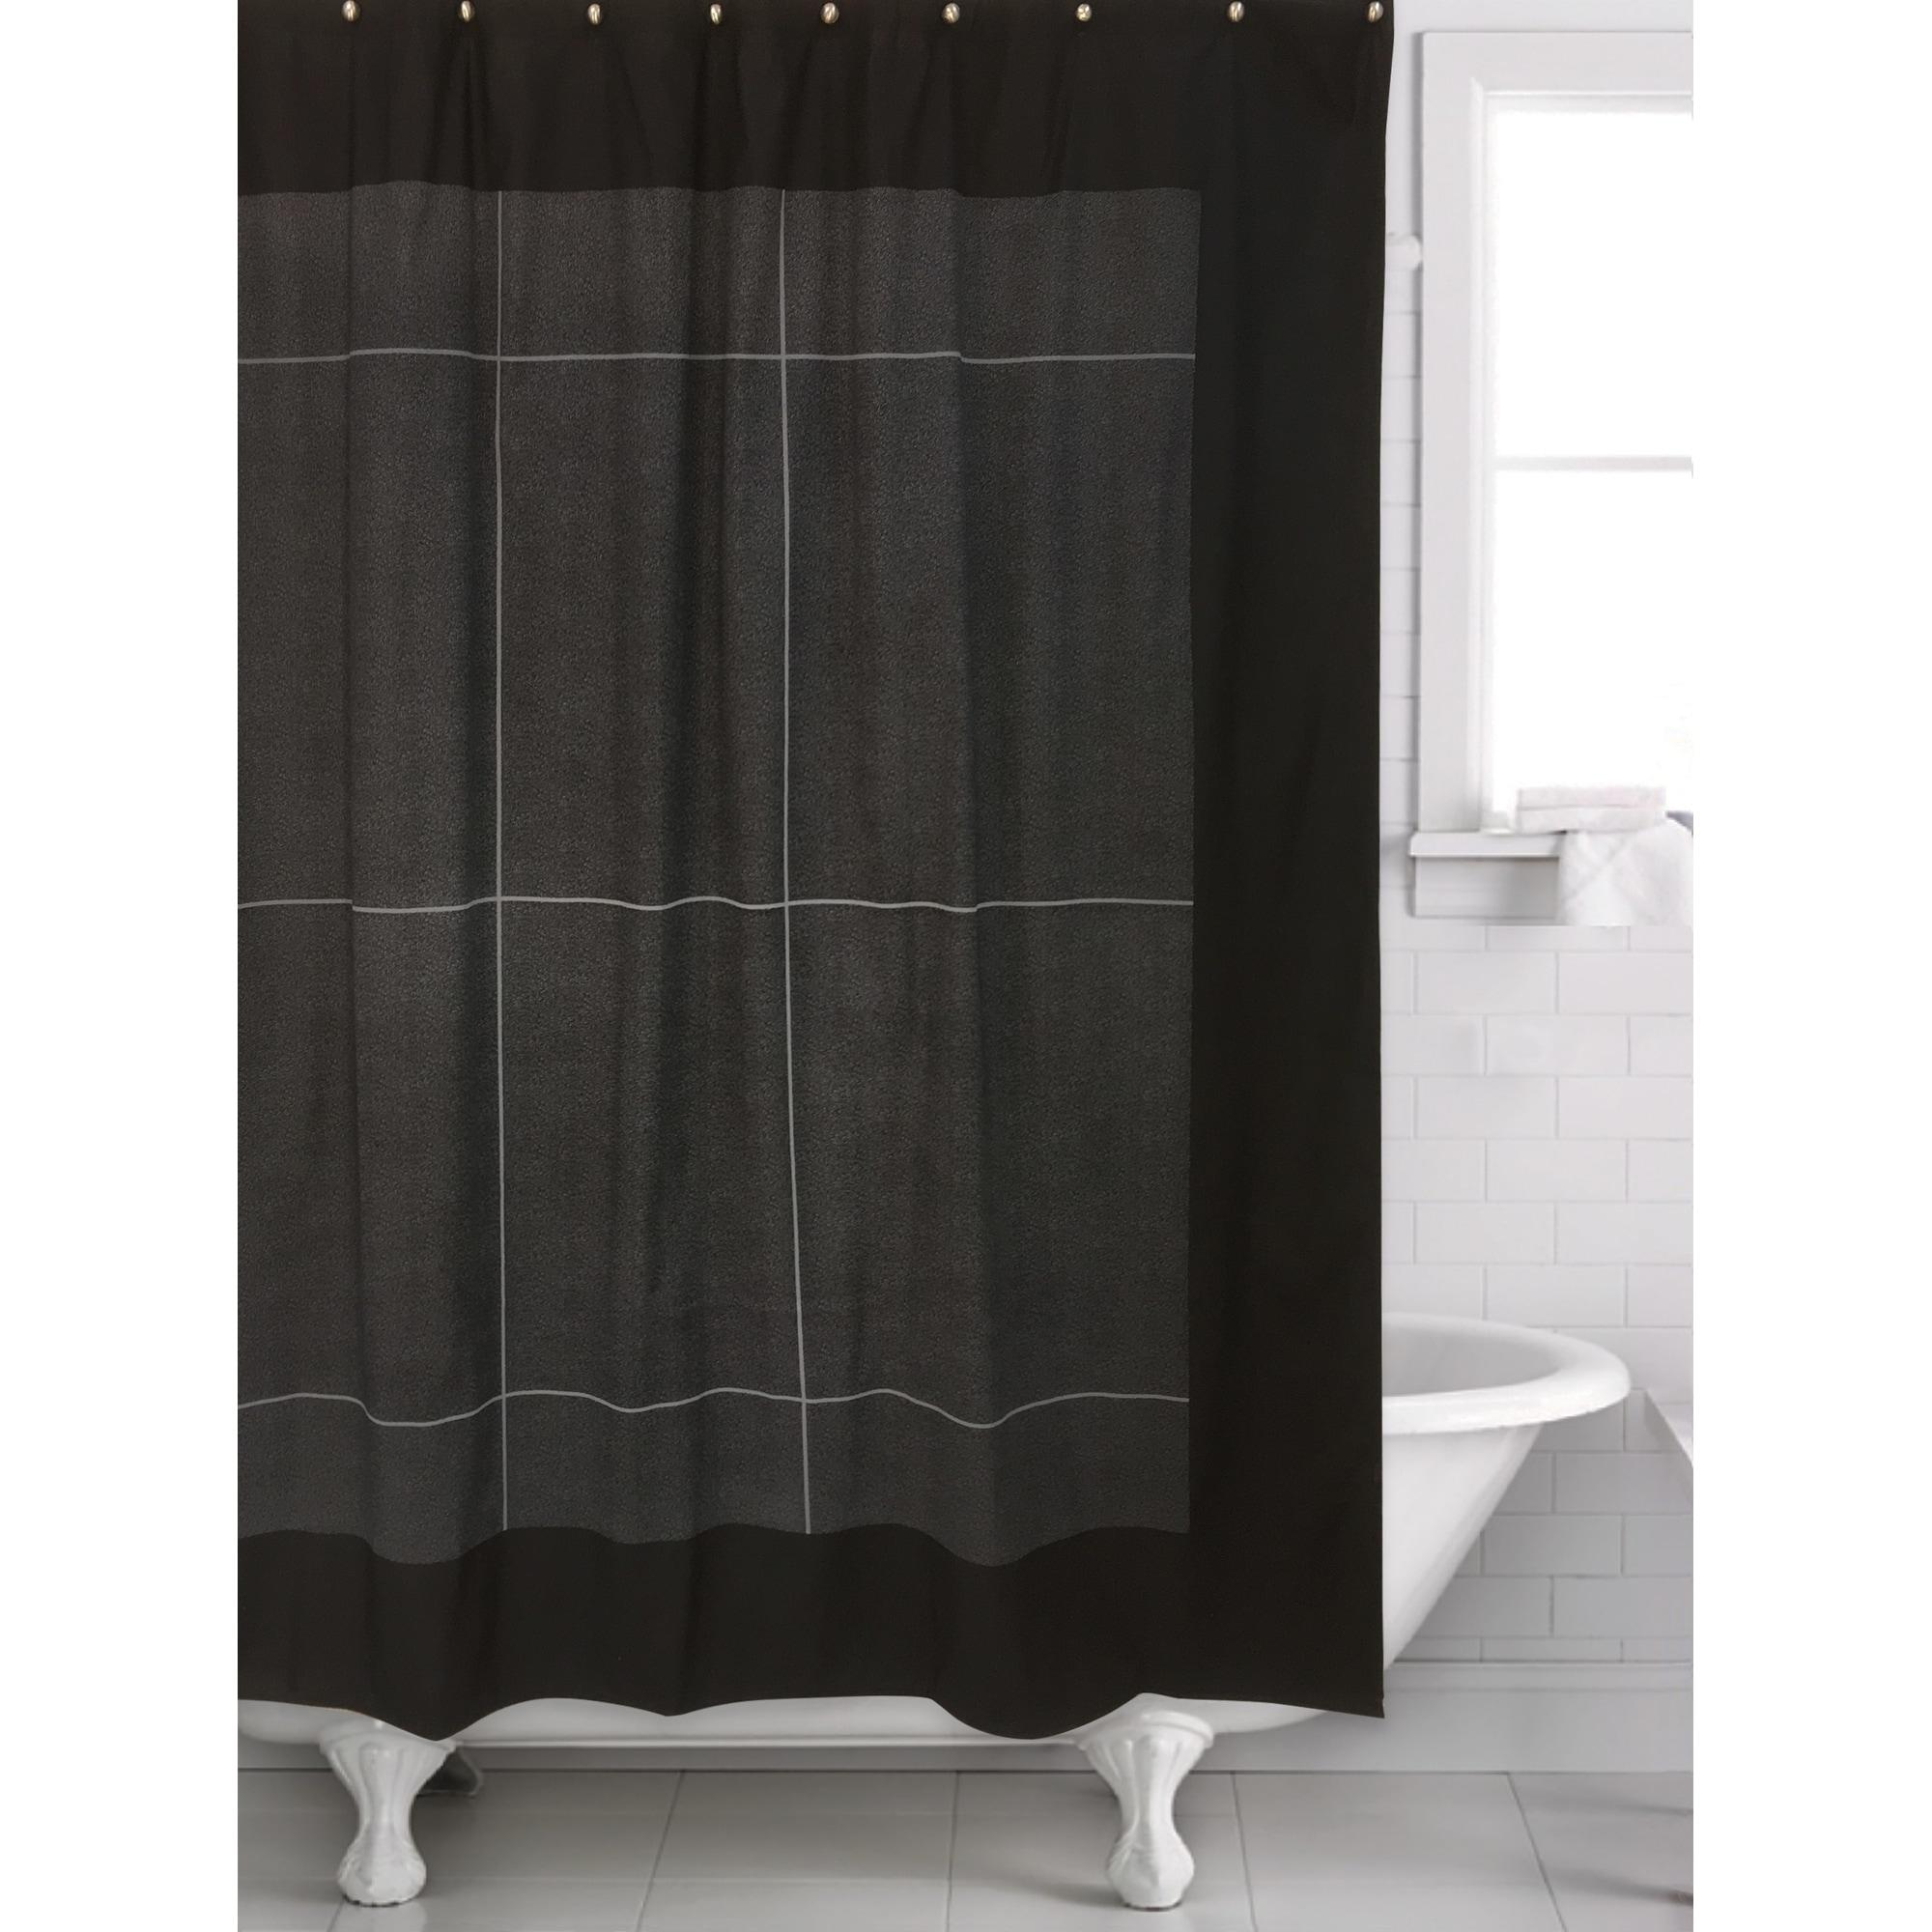 Granite Black Shower Curtain 70 X 72